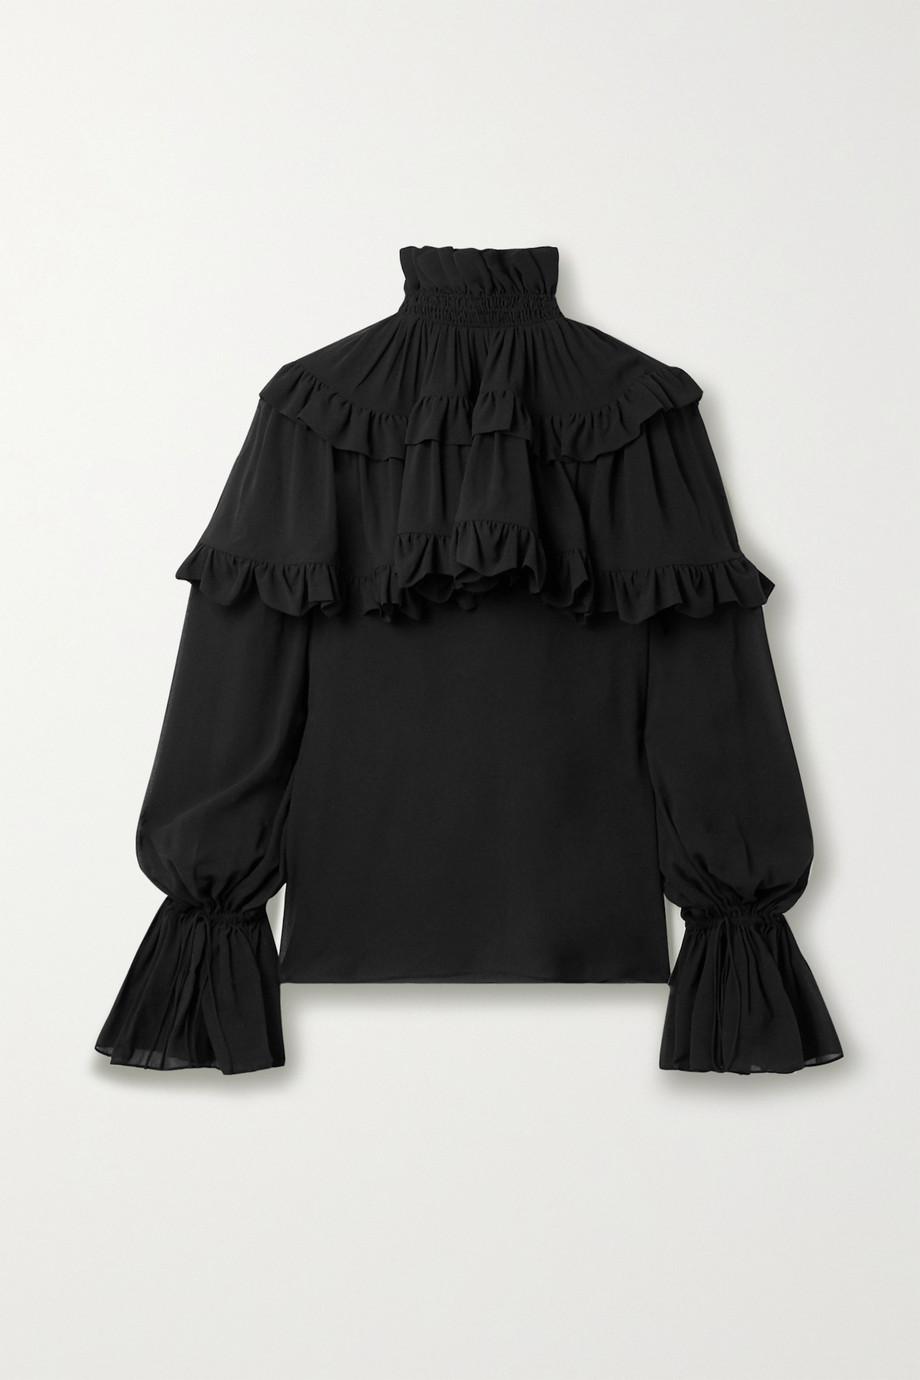 SAINT LAURENT Ruffled tiered silk-chiffon blouse